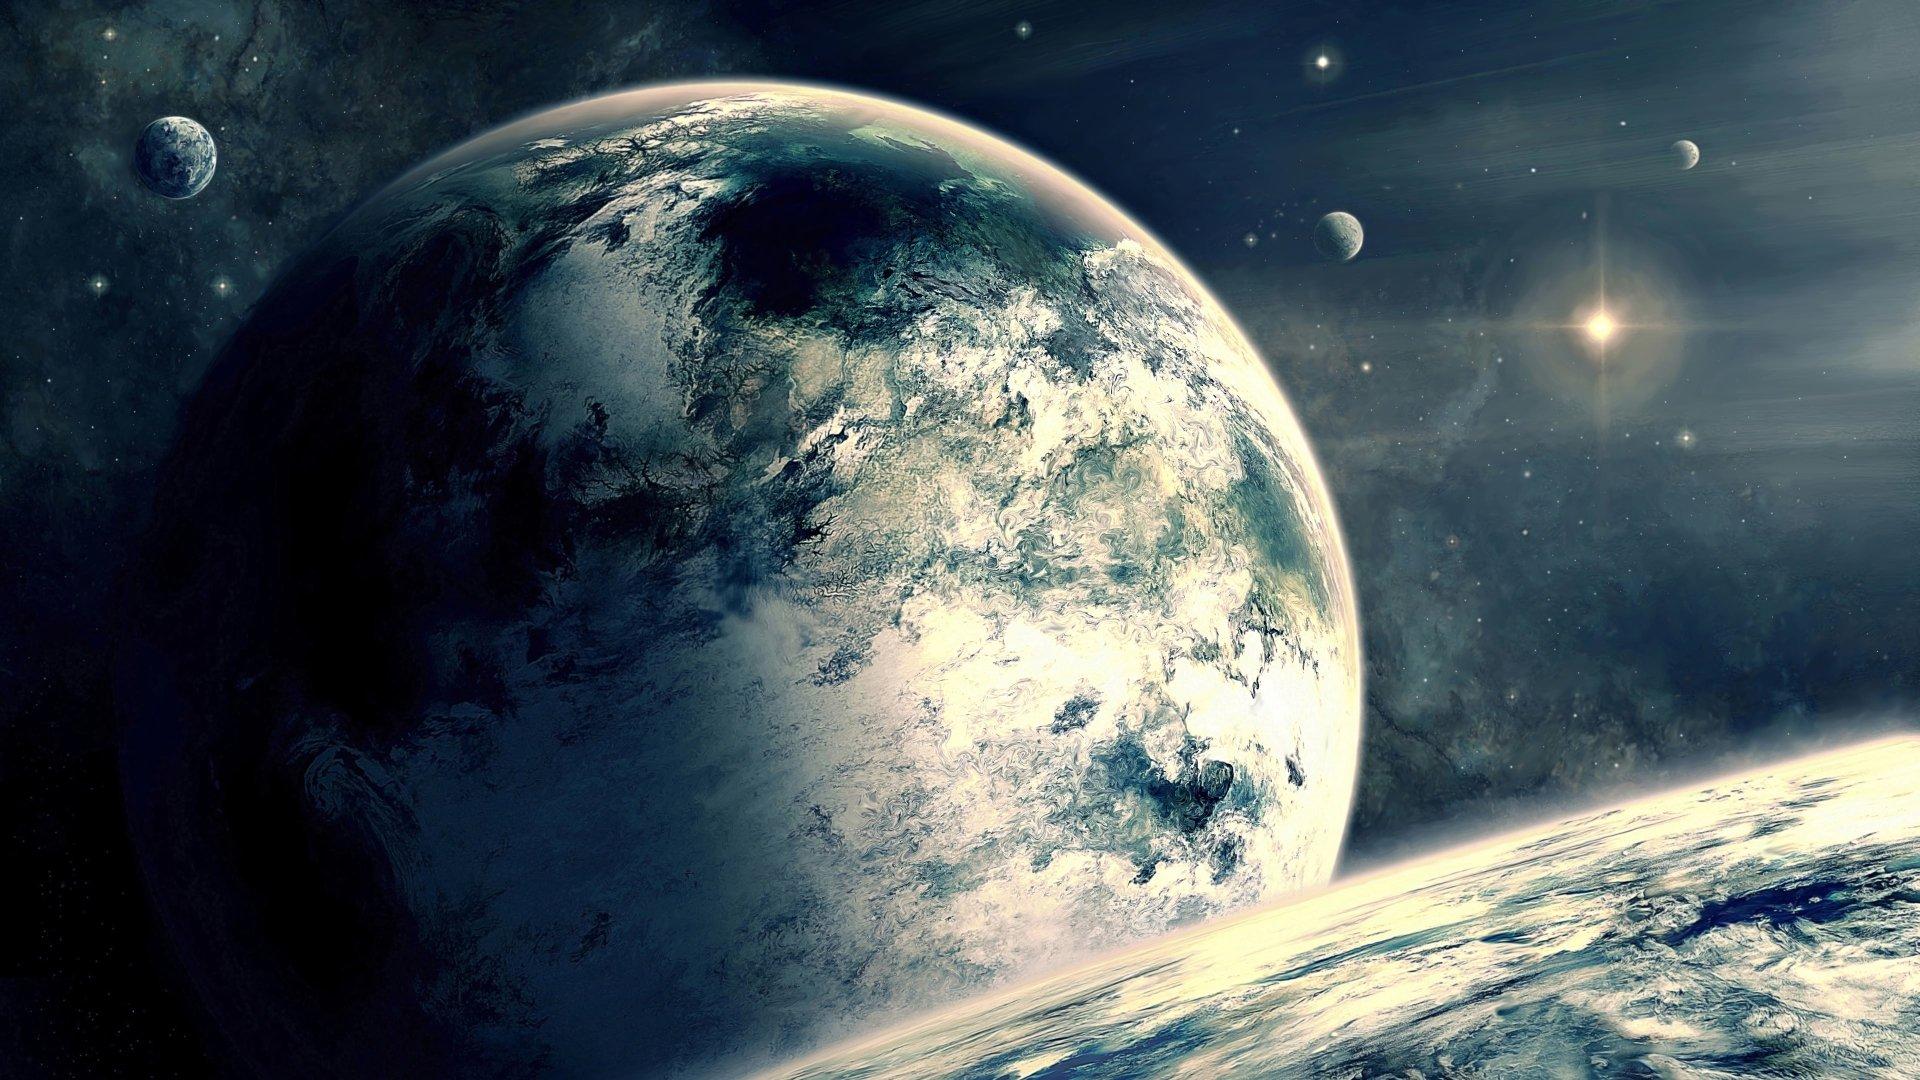 Planète 4k Ultra Fond d'écran HD   Arrière-Plan   3840x2160   ID:476258 - Wallpaper Abyss